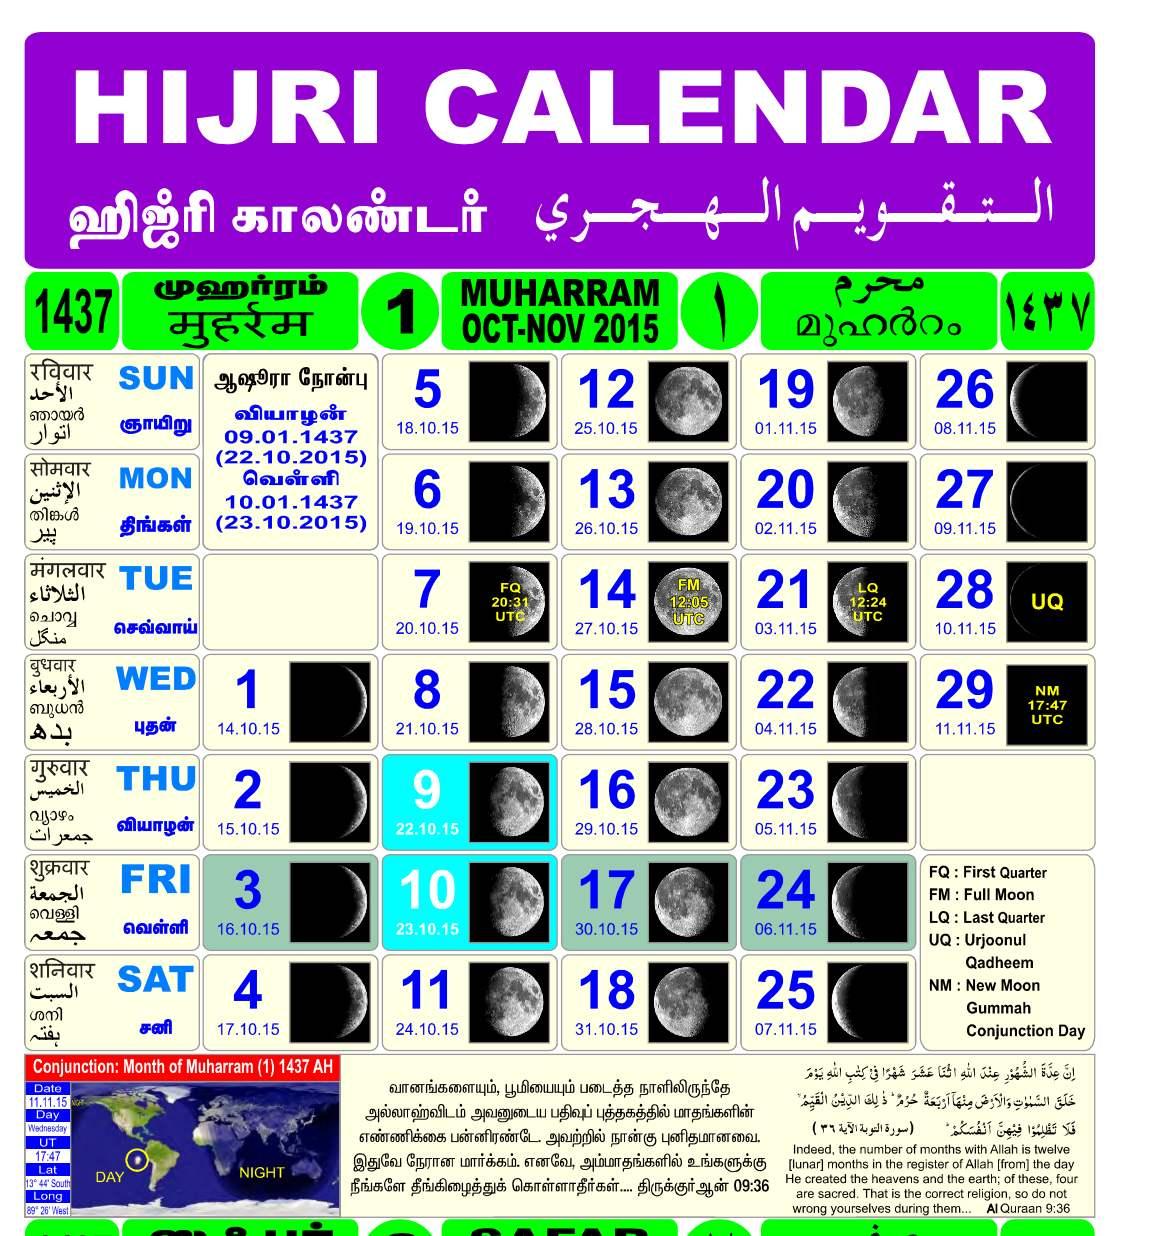 Perhitungan Kalender Hijriah atau Kalender Komariah   Guru Geografi